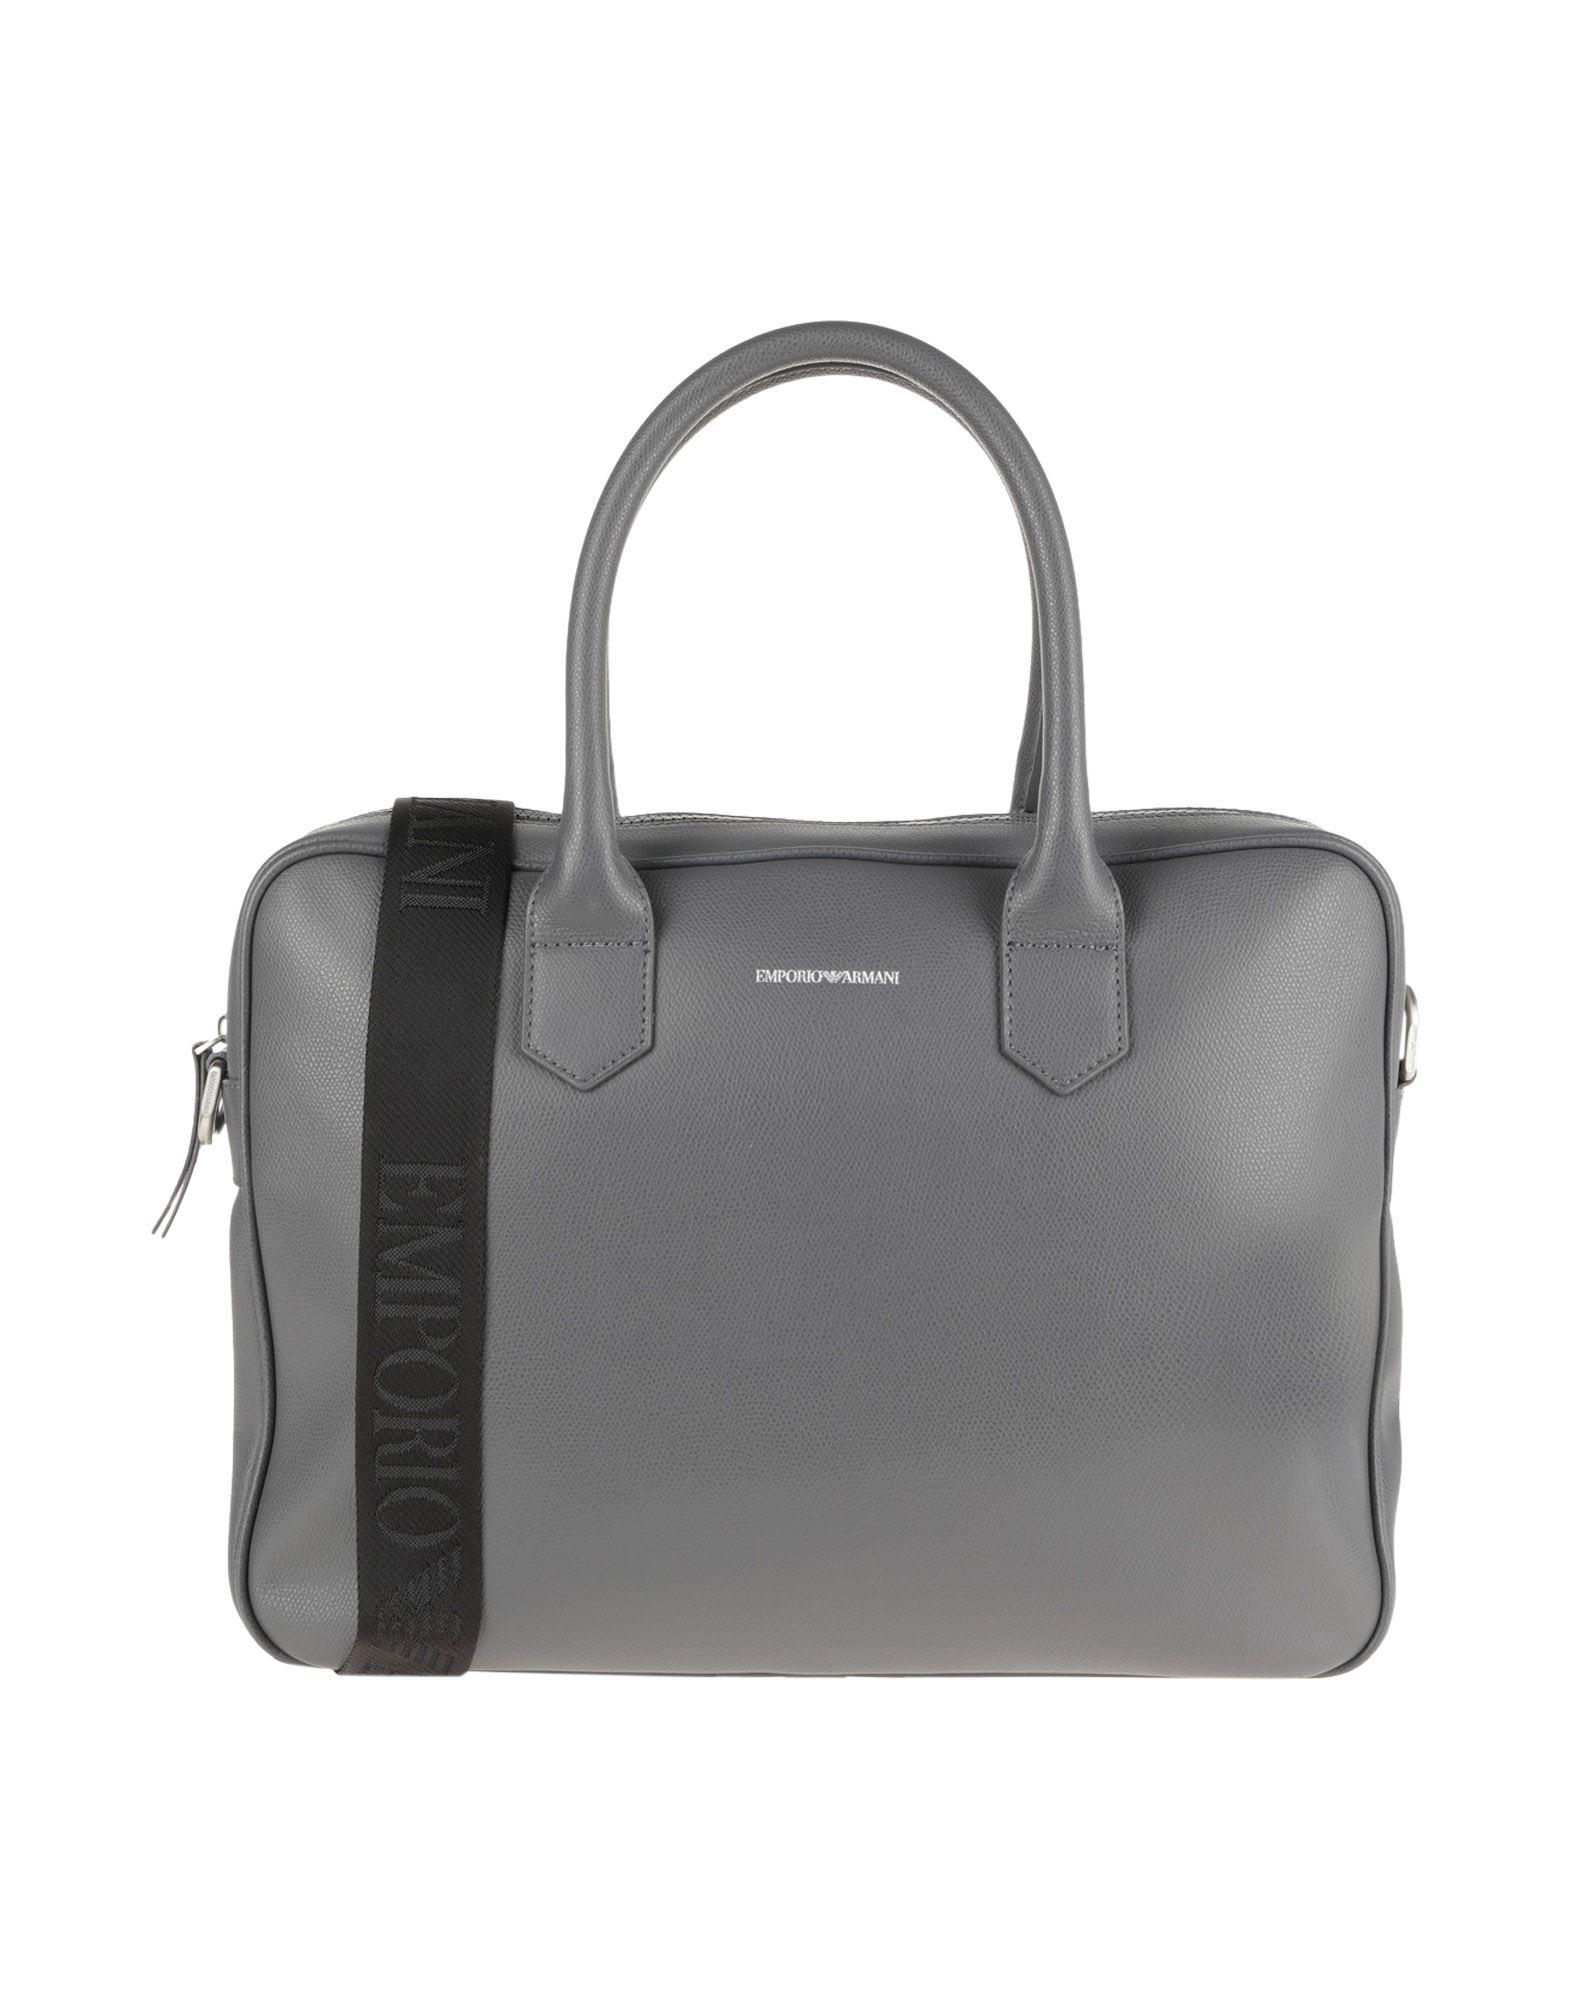 emporio armani деловые сумки EMPORIO ARMANI Деловые сумки